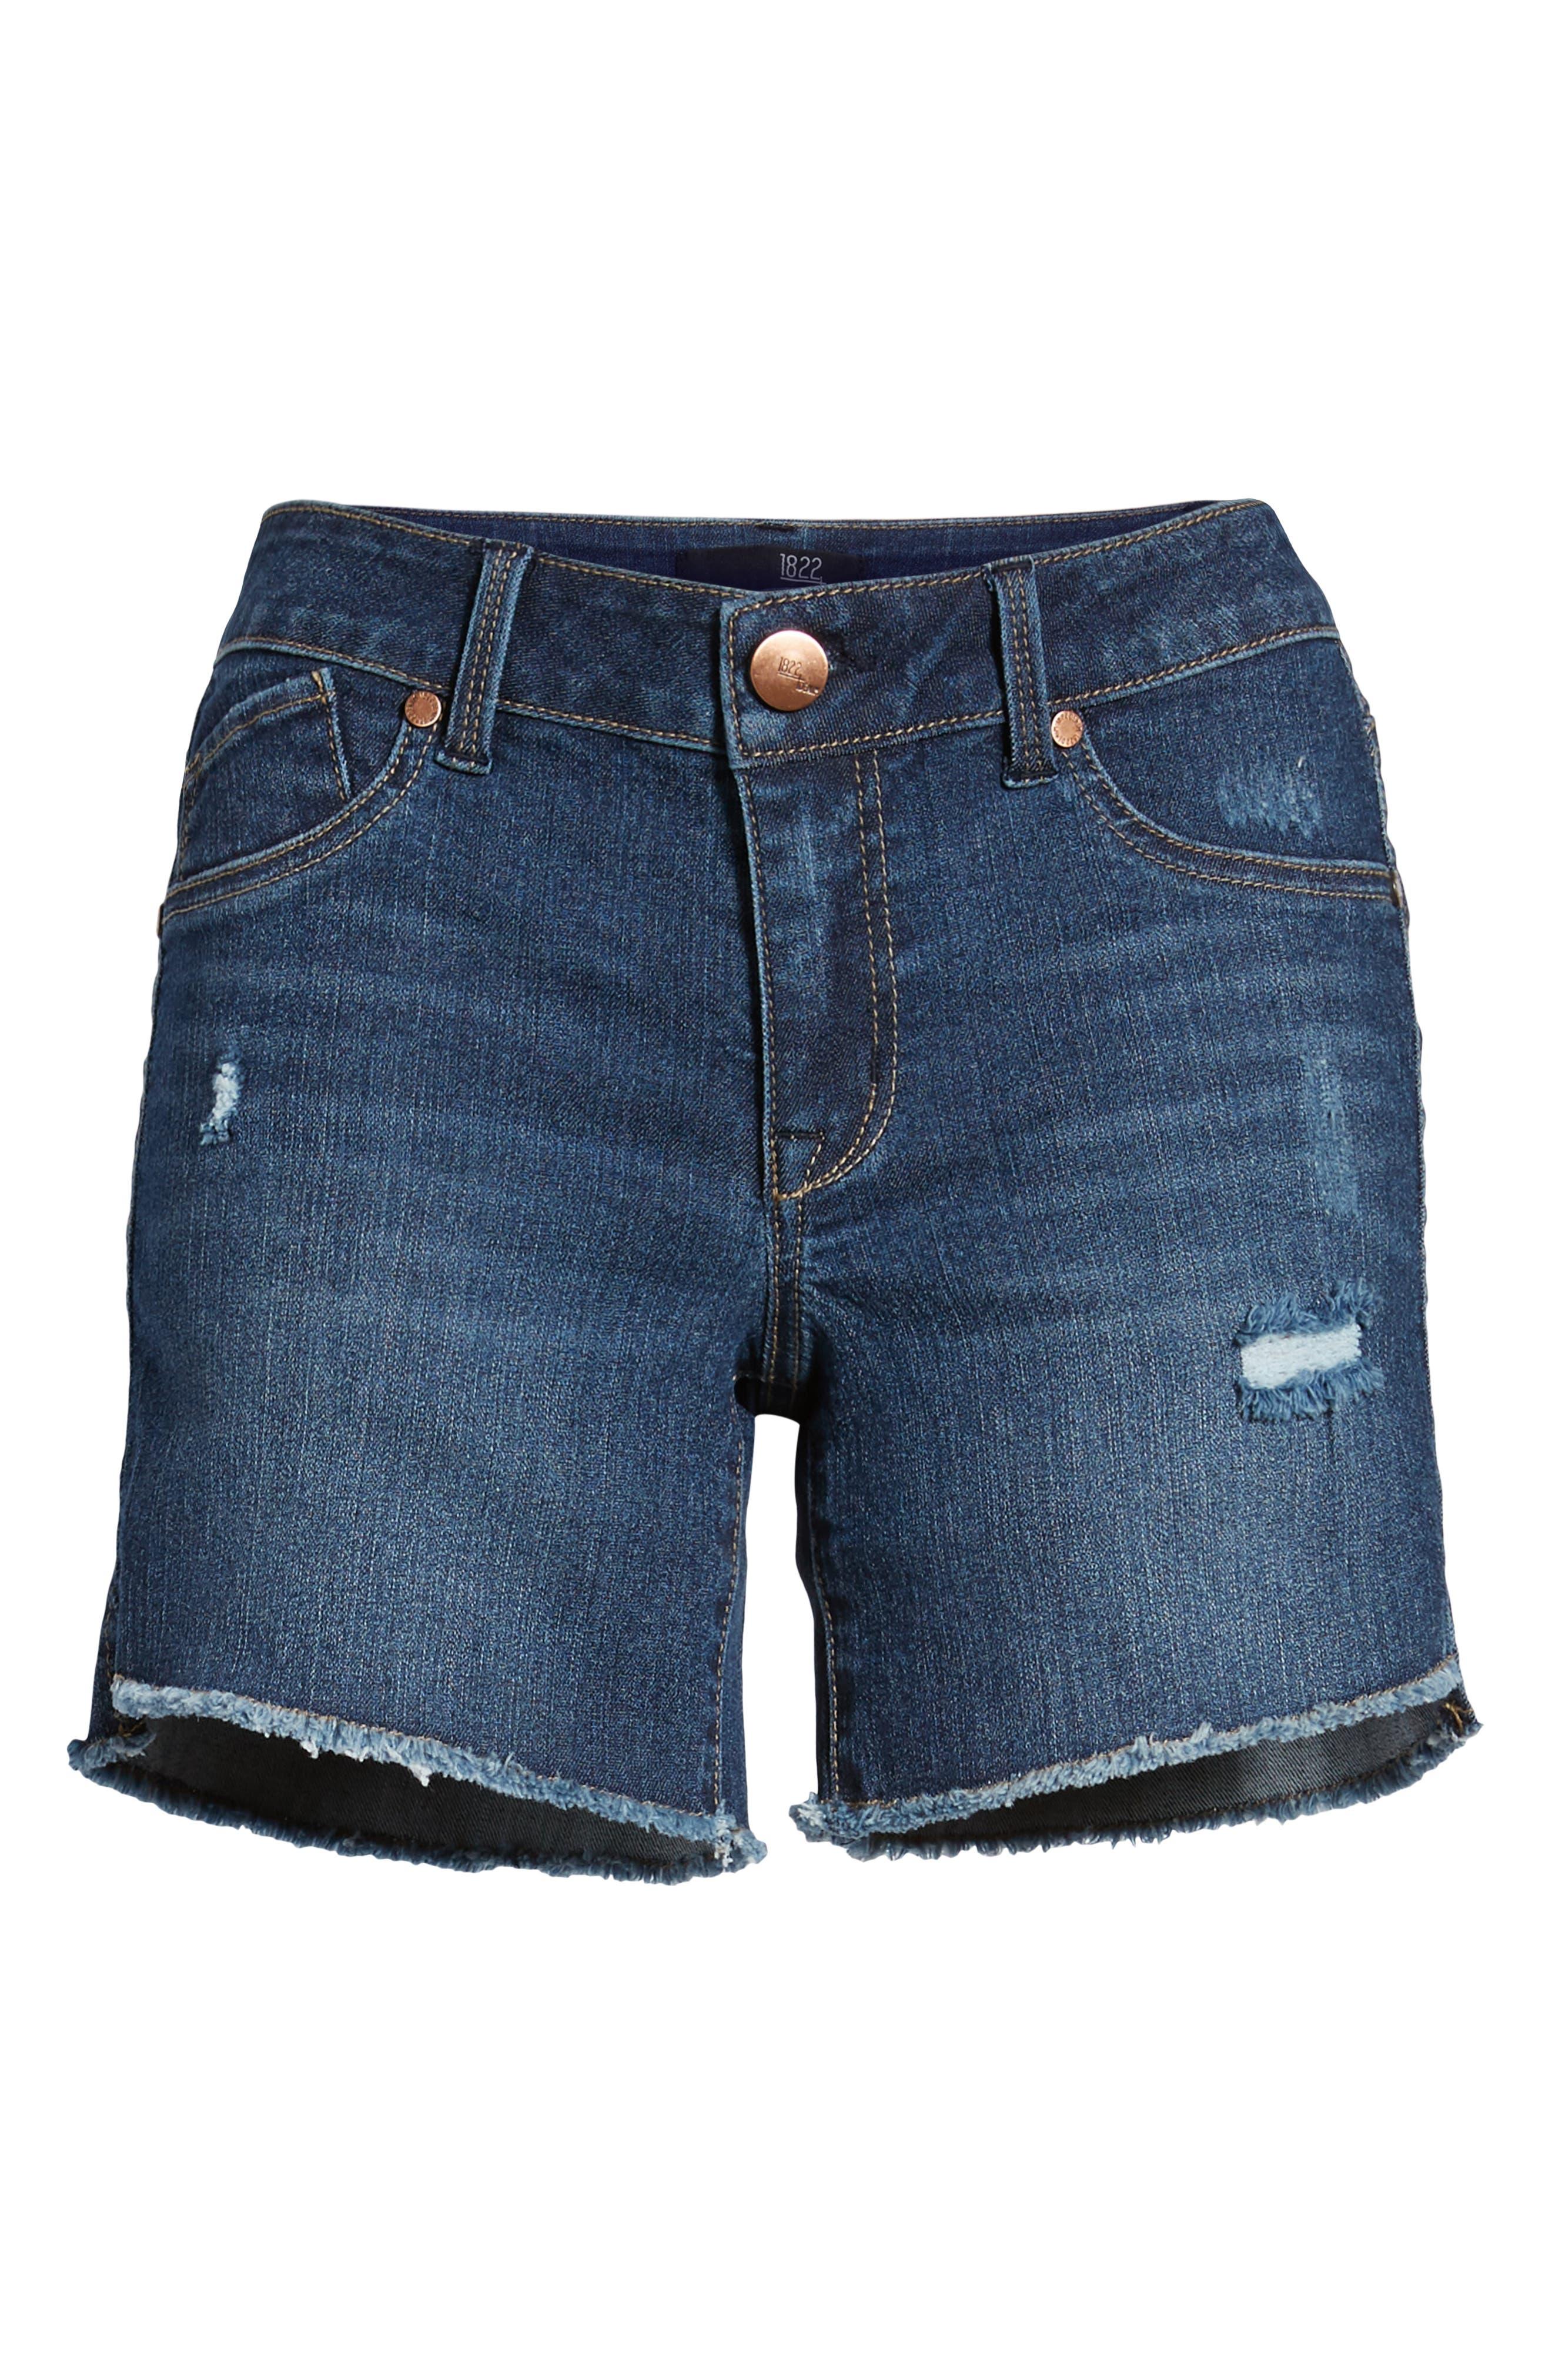 Side Slit Cutoff Denim Shorts,                             Alternate thumbnail 7, color,                             400